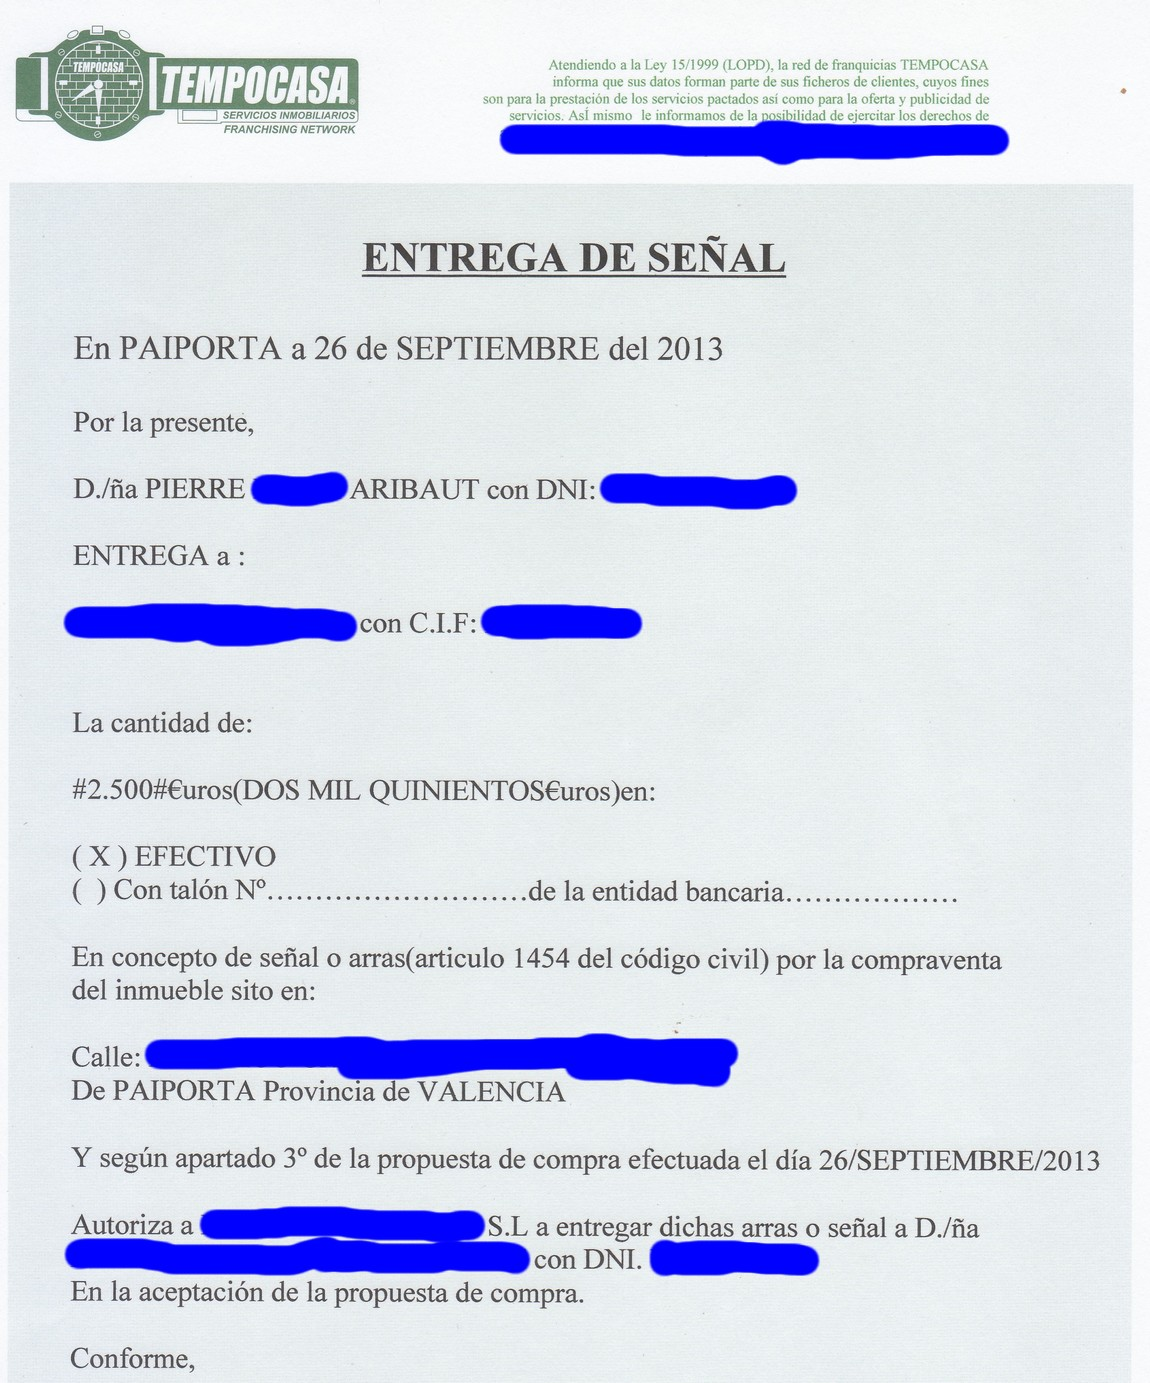 acompte-2500-euros-achat-4eme-appartement-paiporta-valencia-26-septembre-2013.jpg